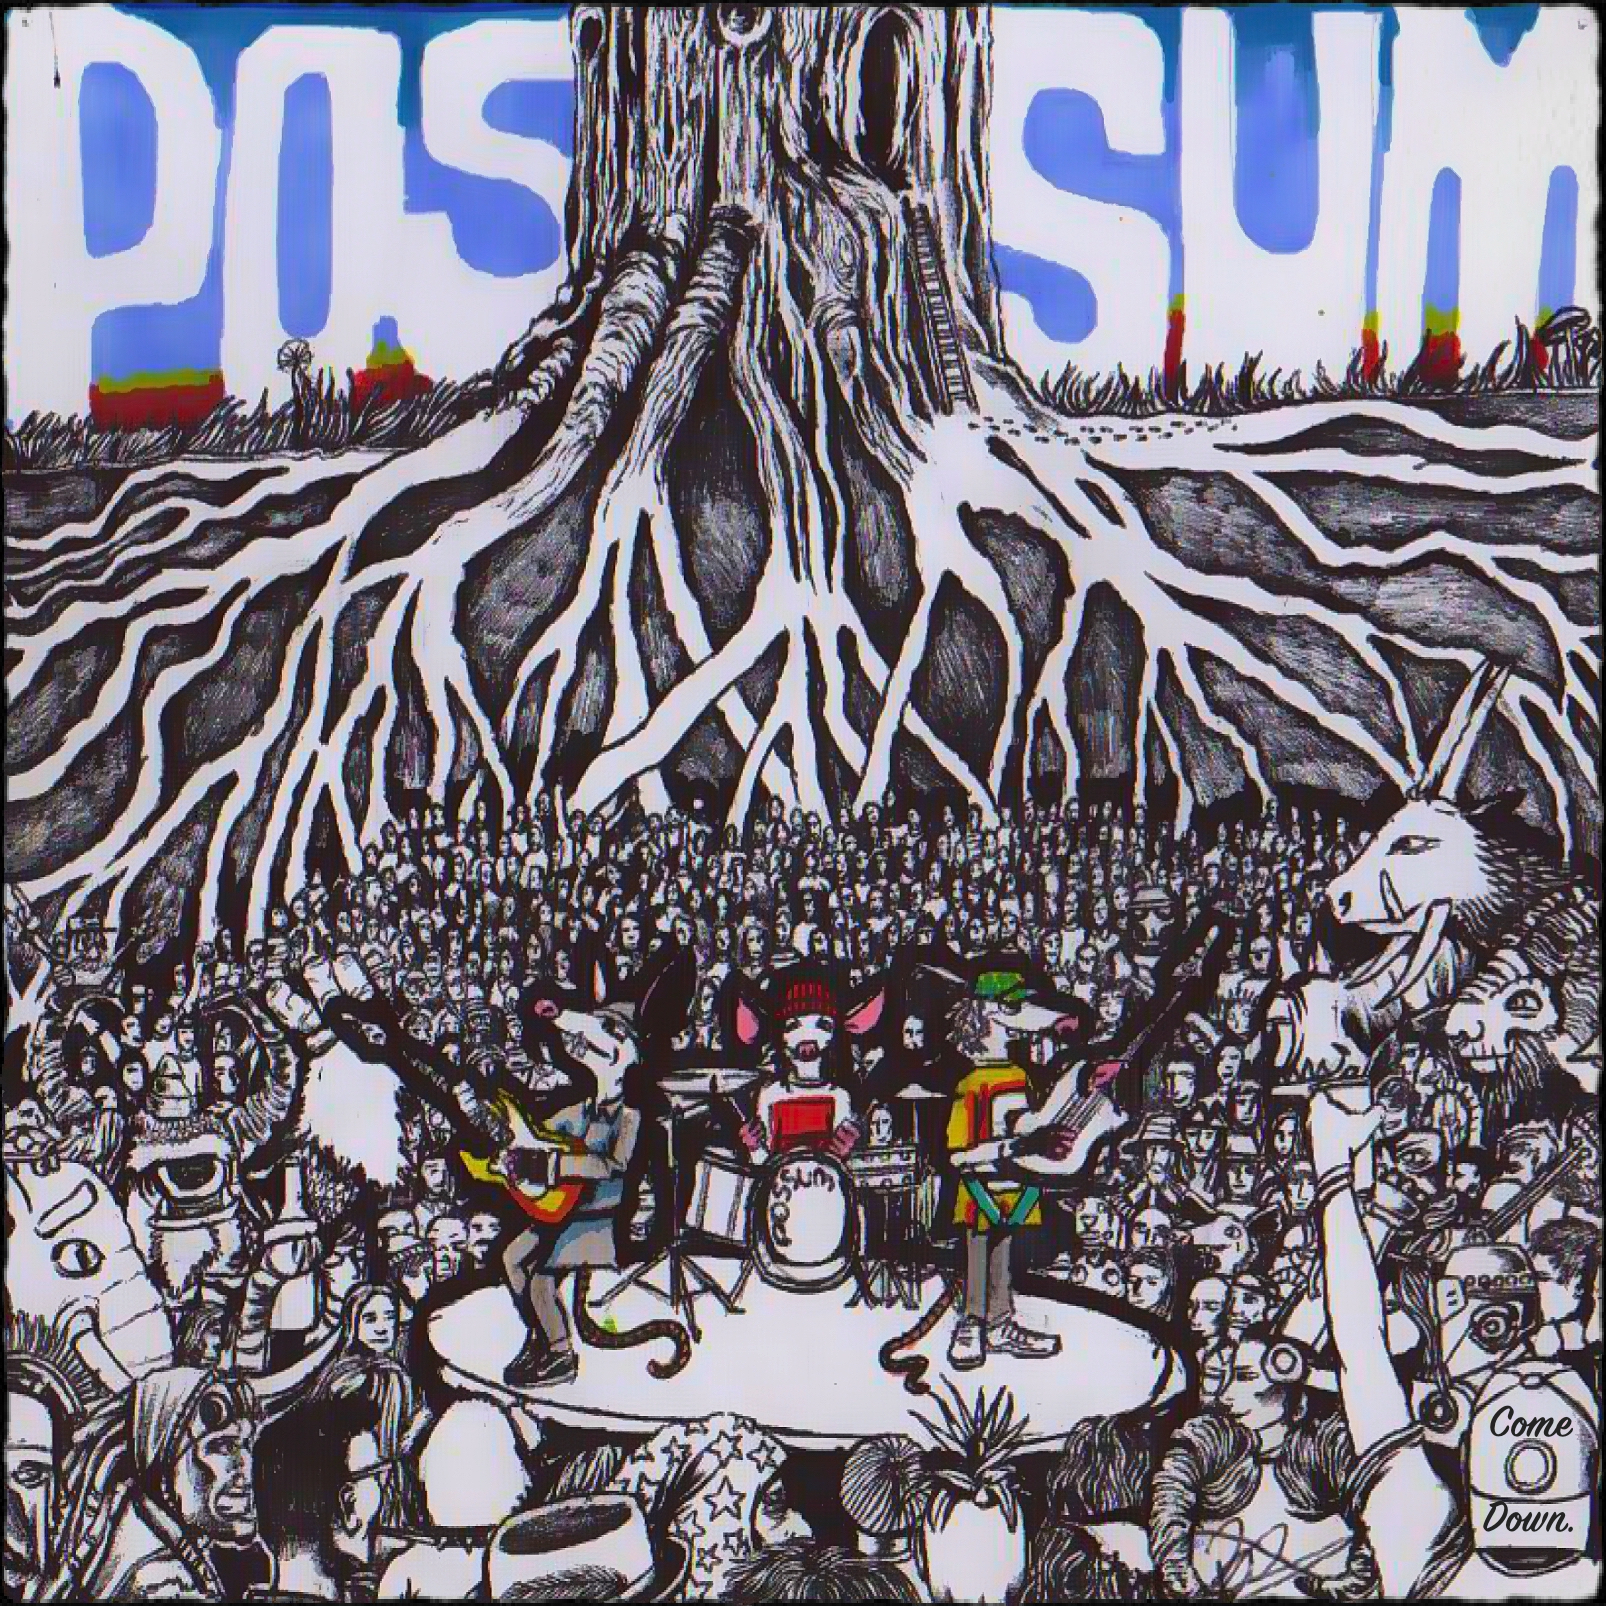 Possum - Come Down EP